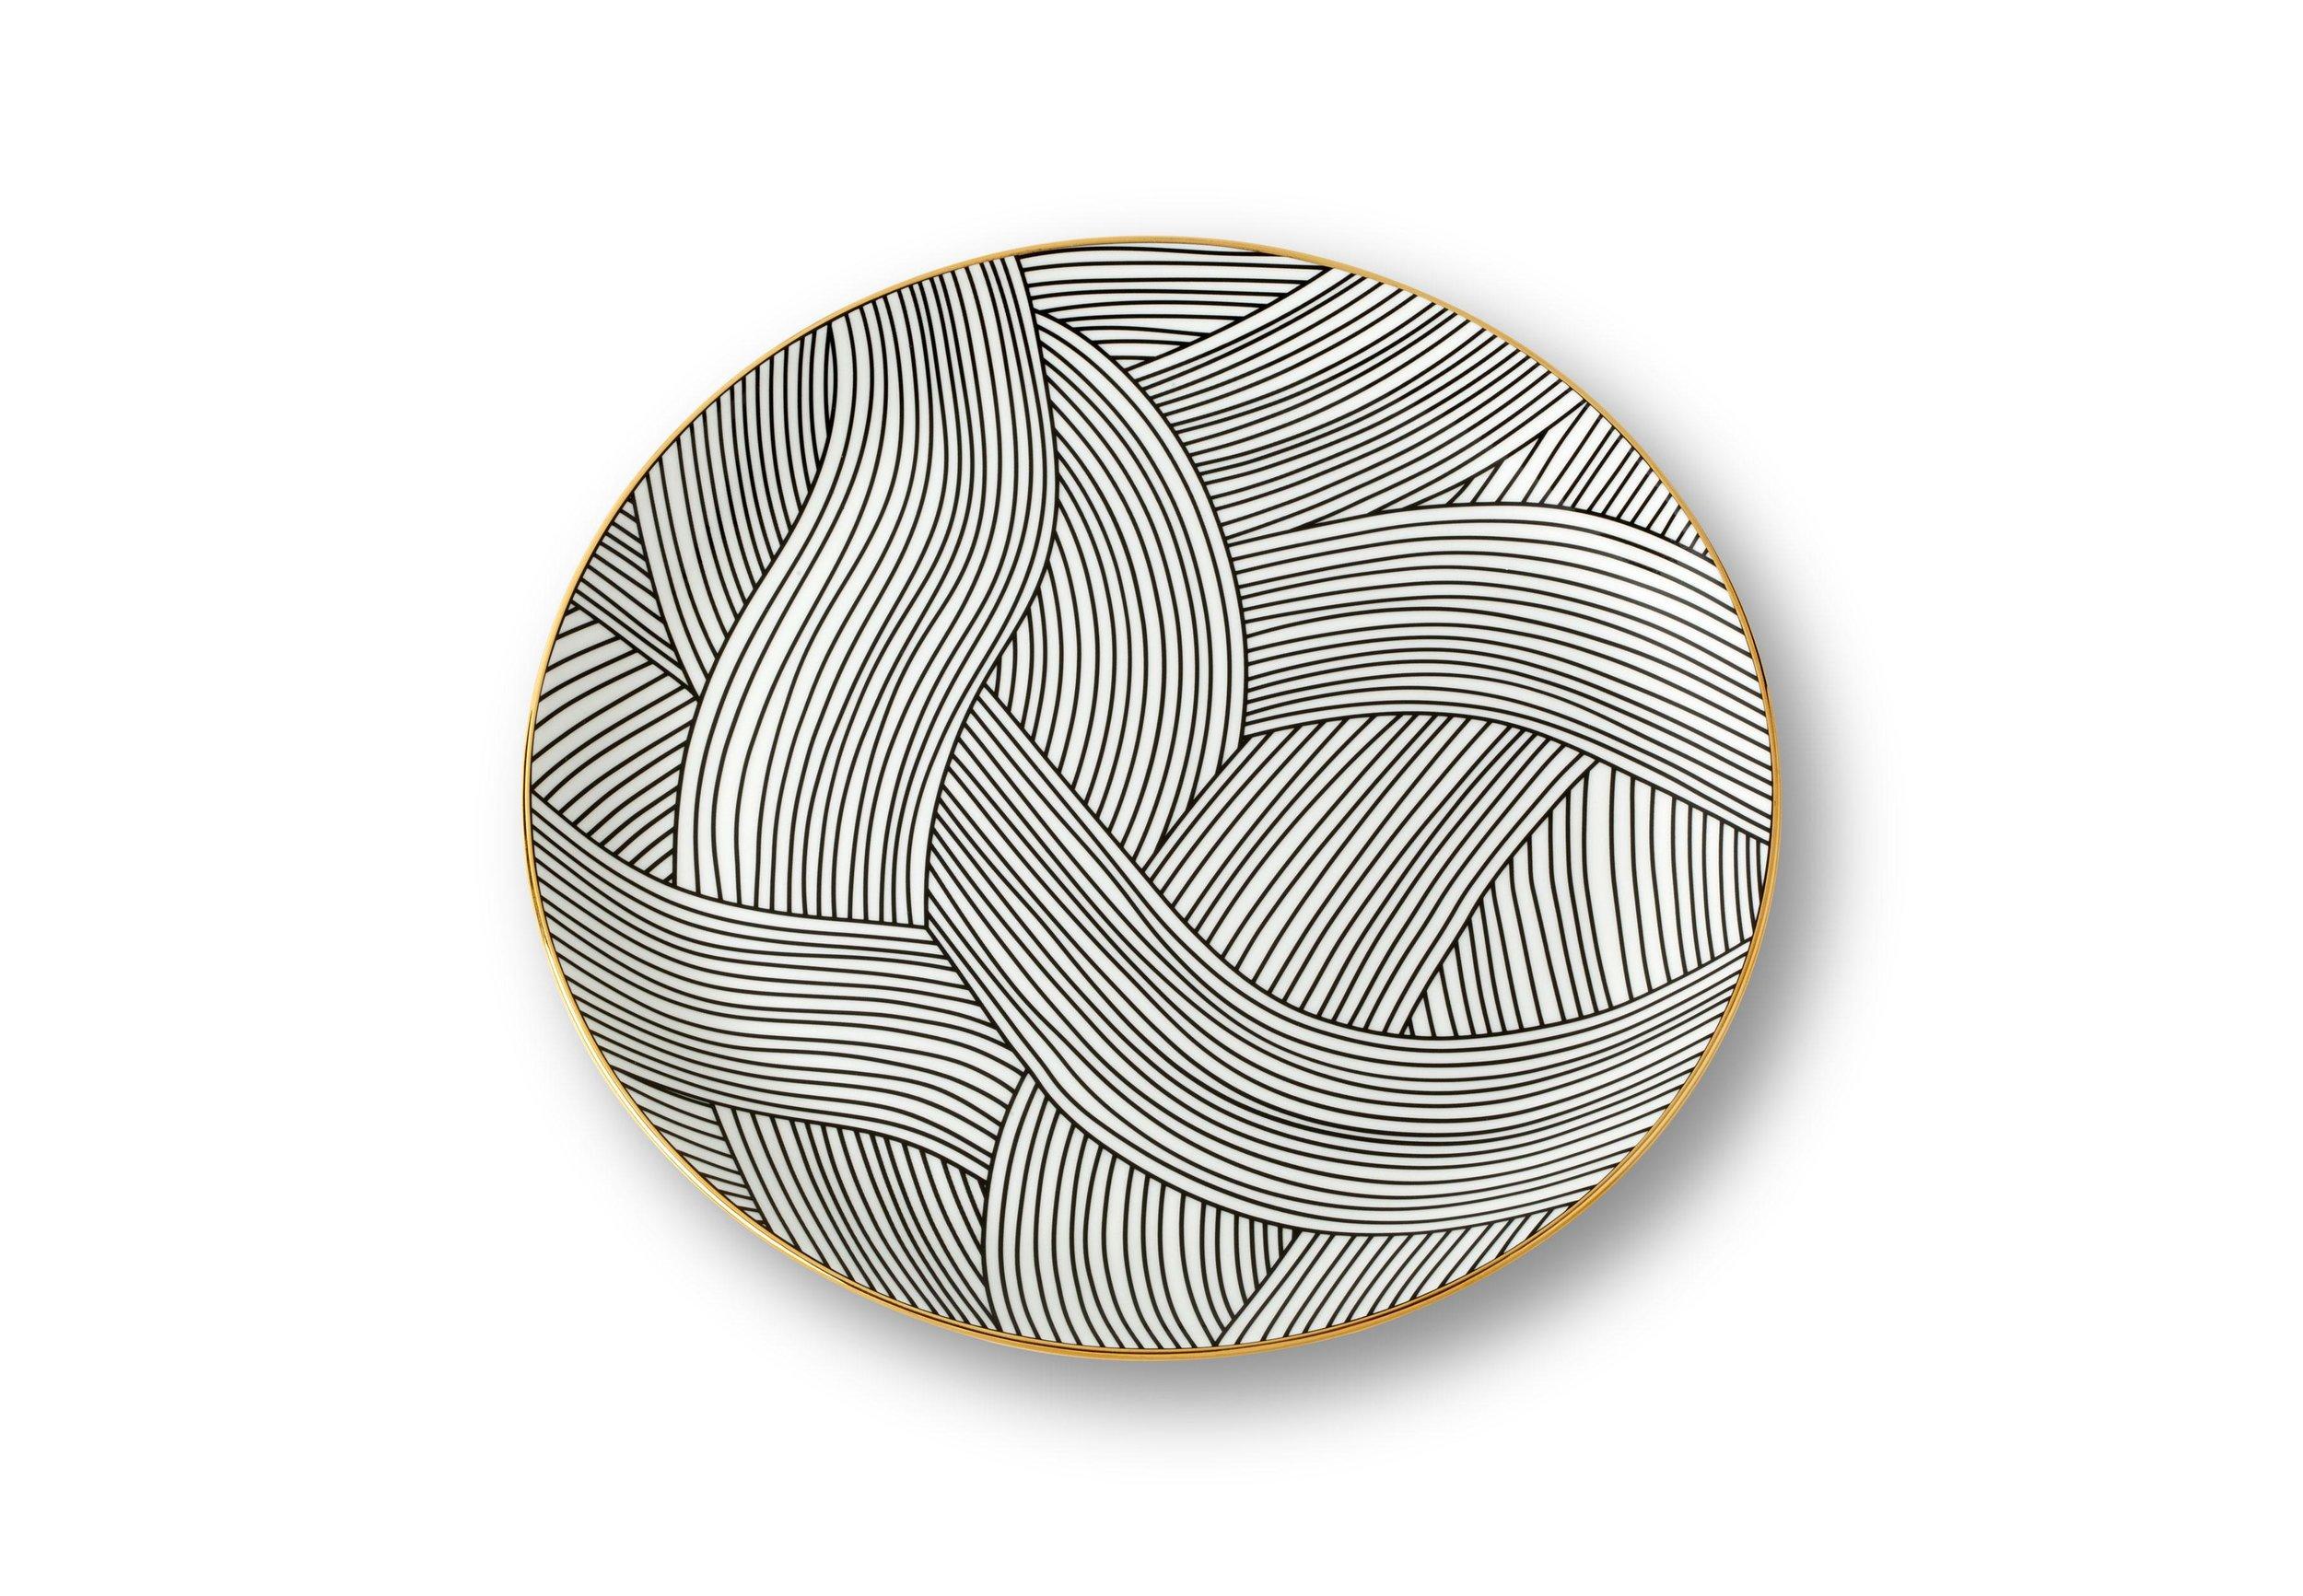 Lustre plate / Bethan Gray